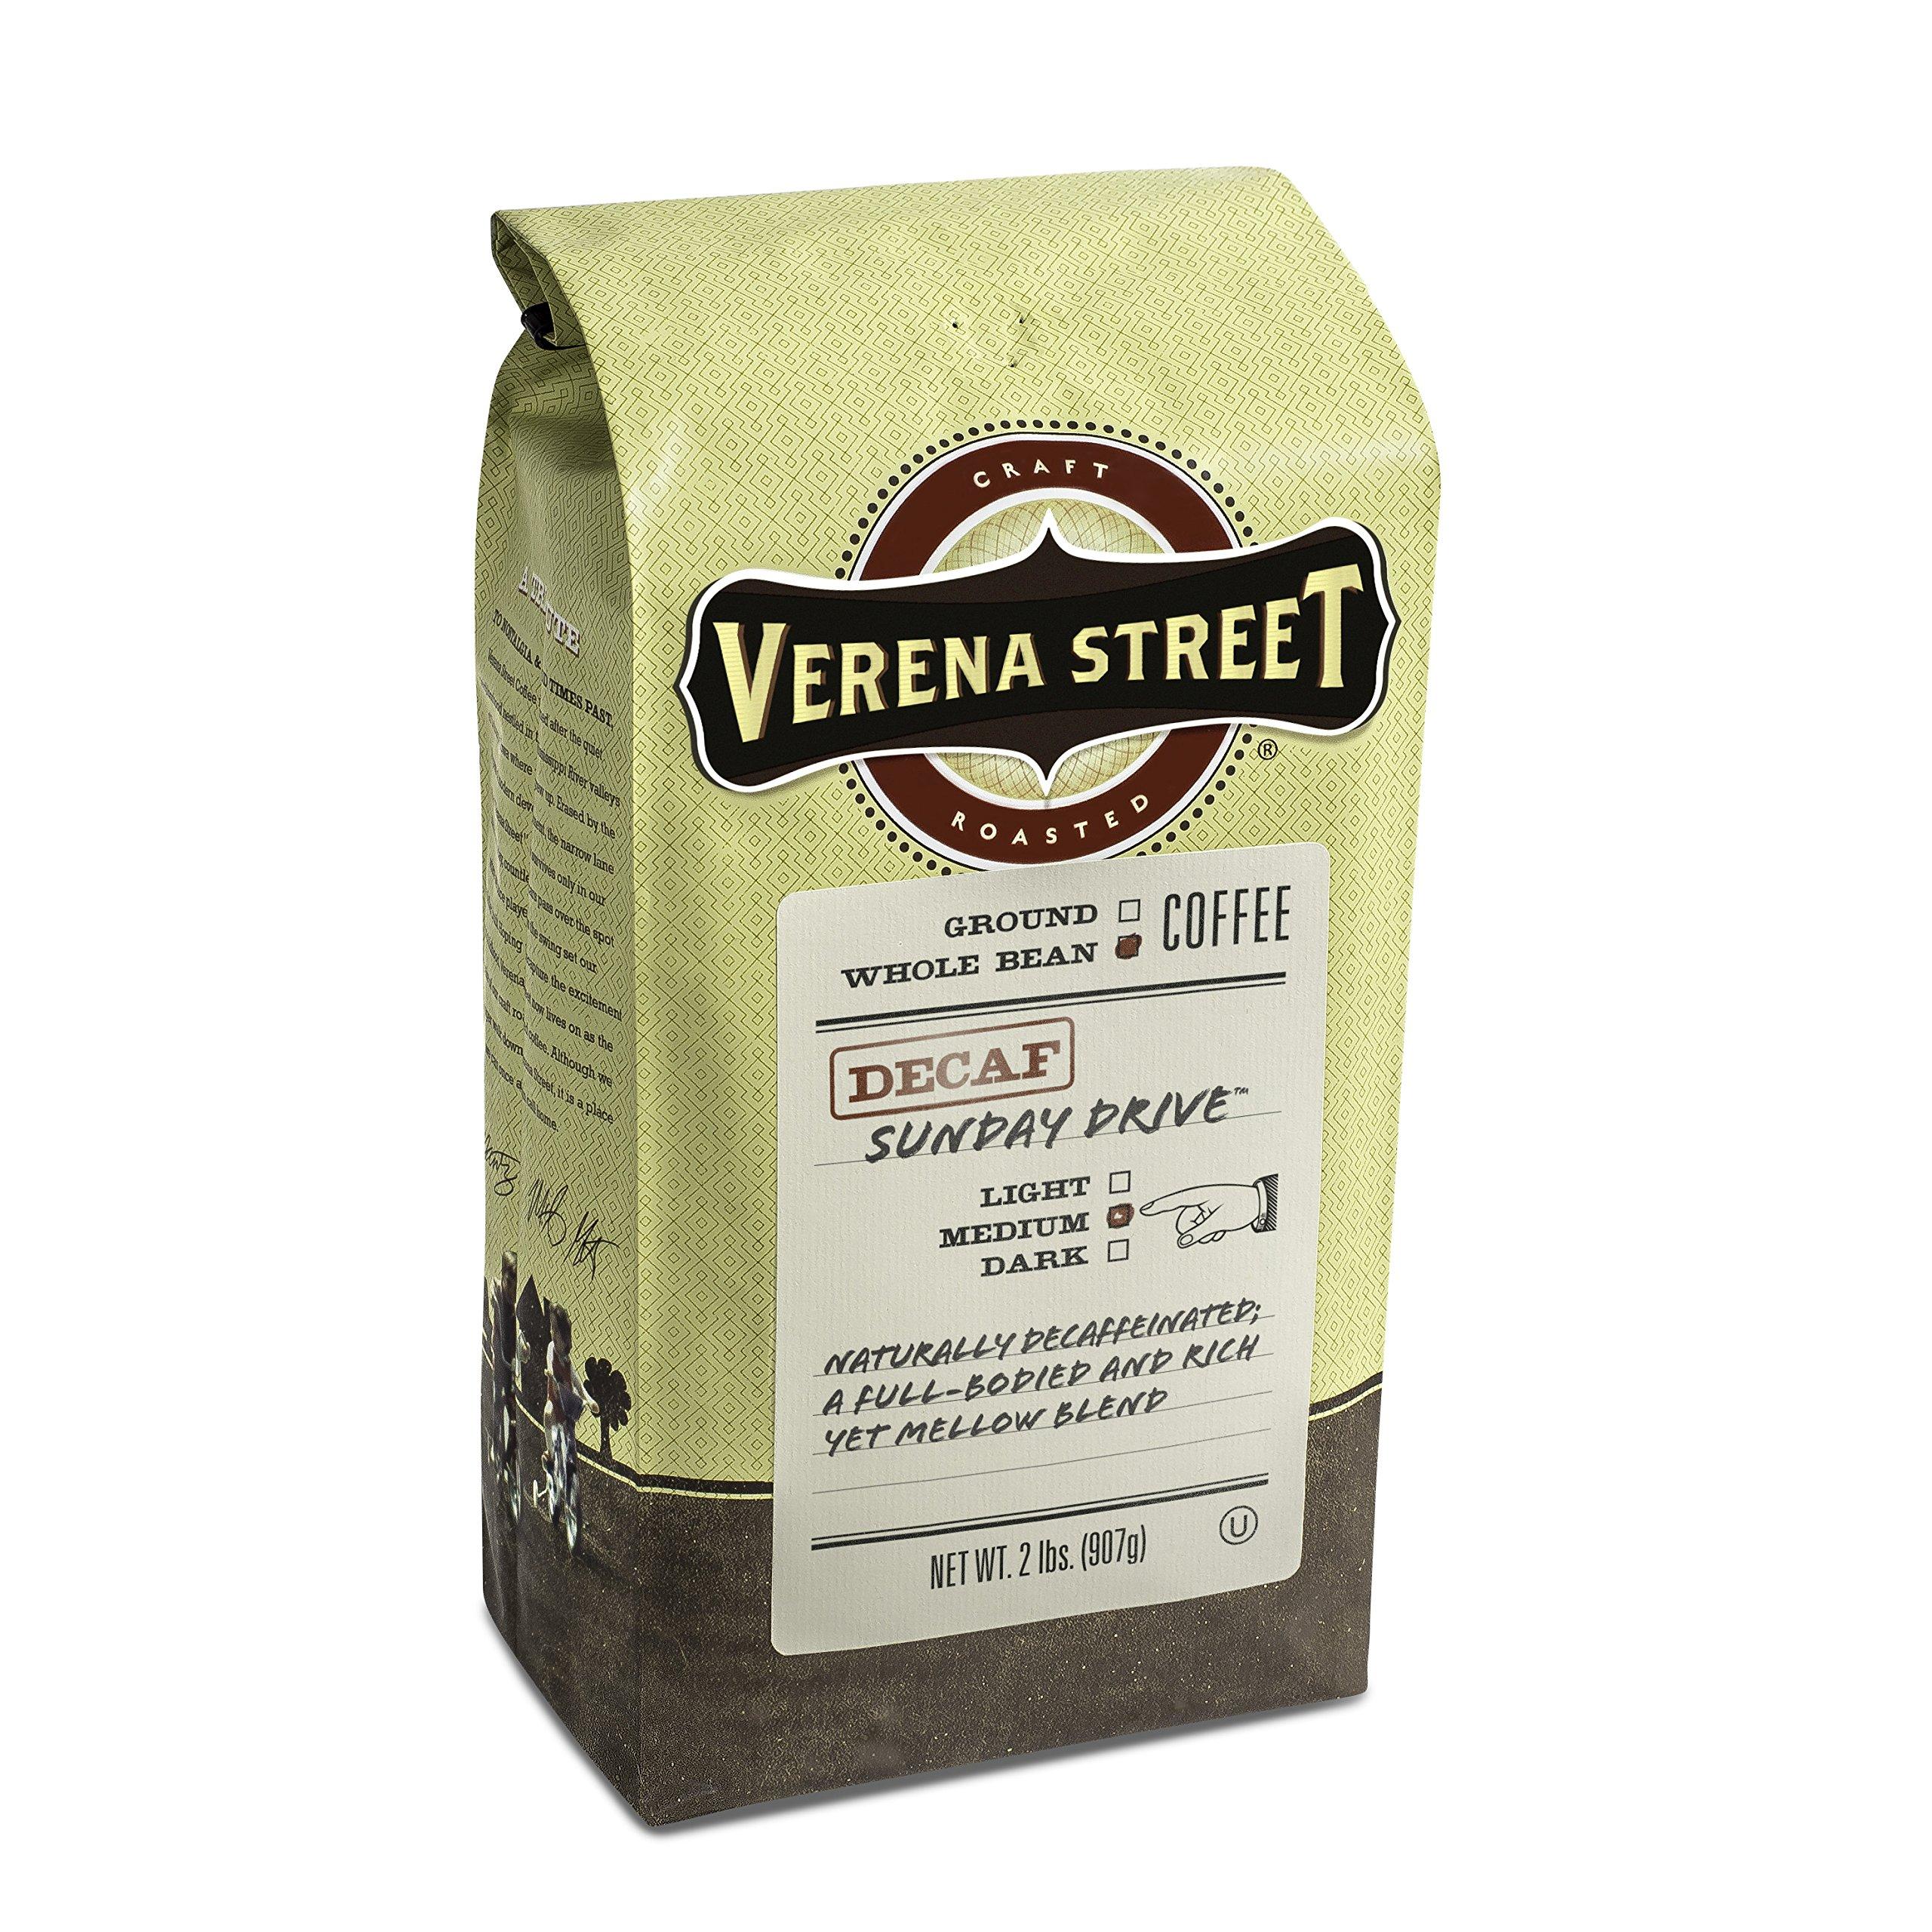 Verena Street Review